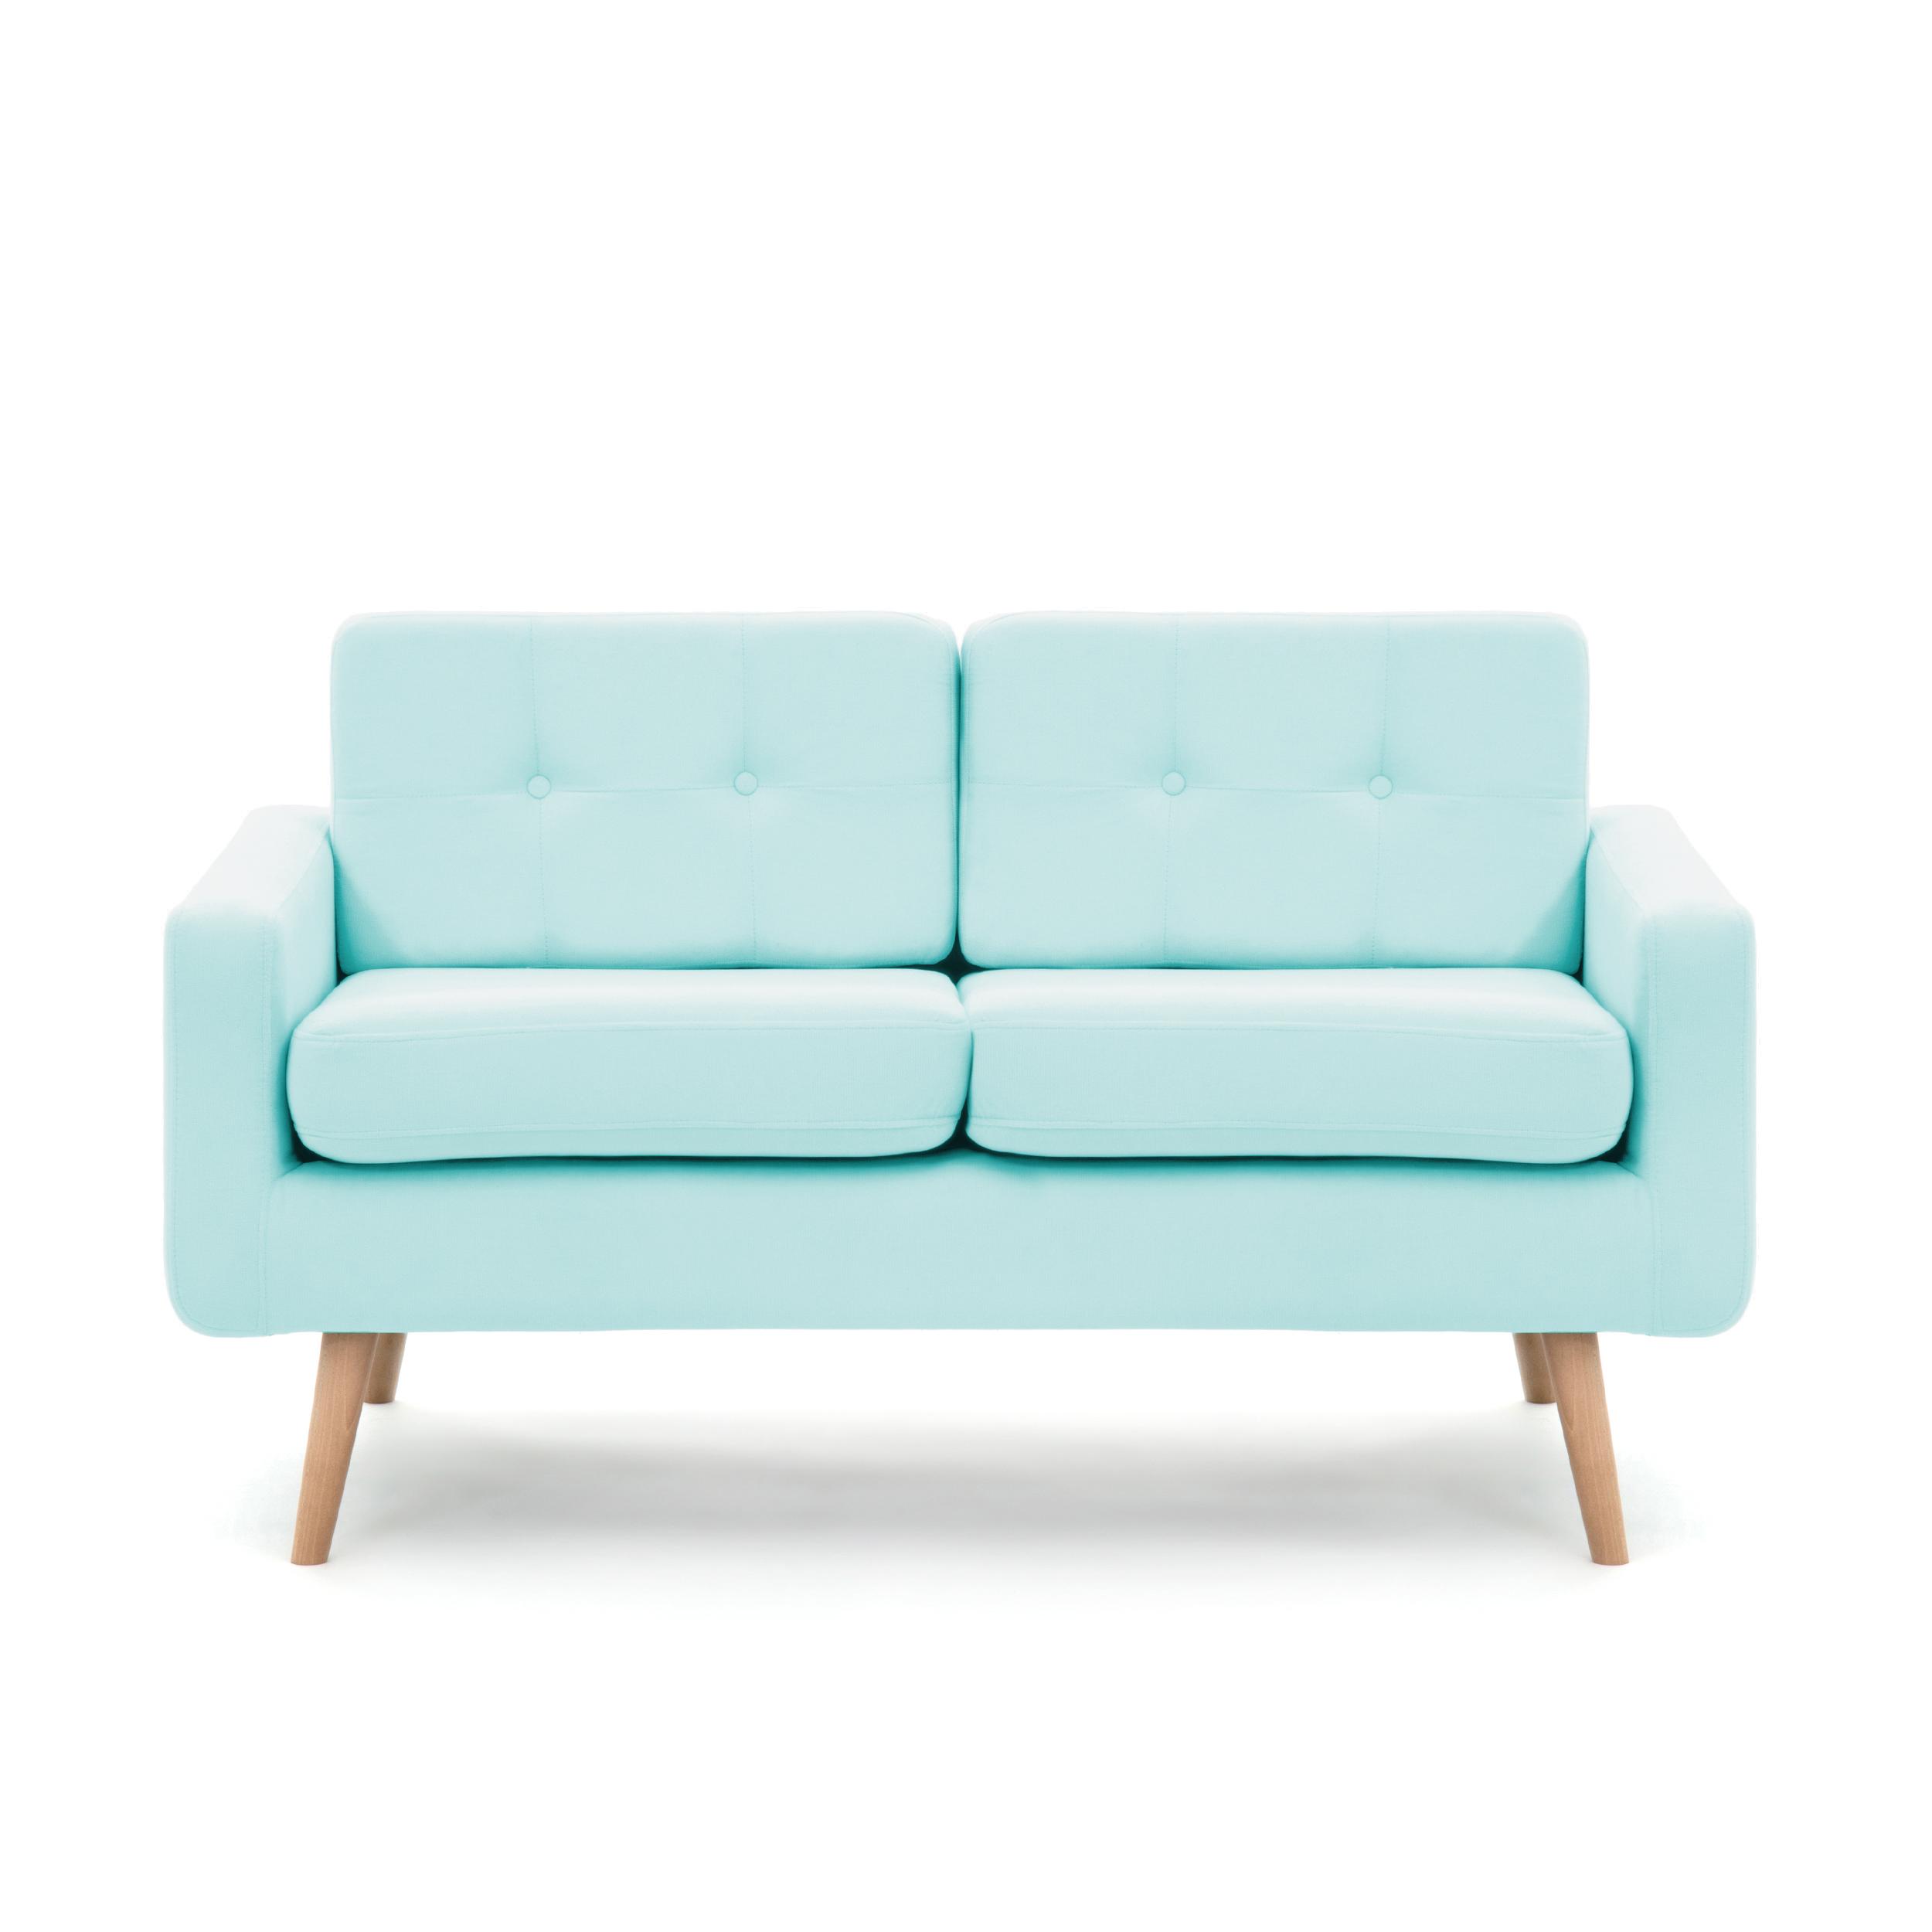 Canapea Fixa 2 locuri Ina Pastel Blue